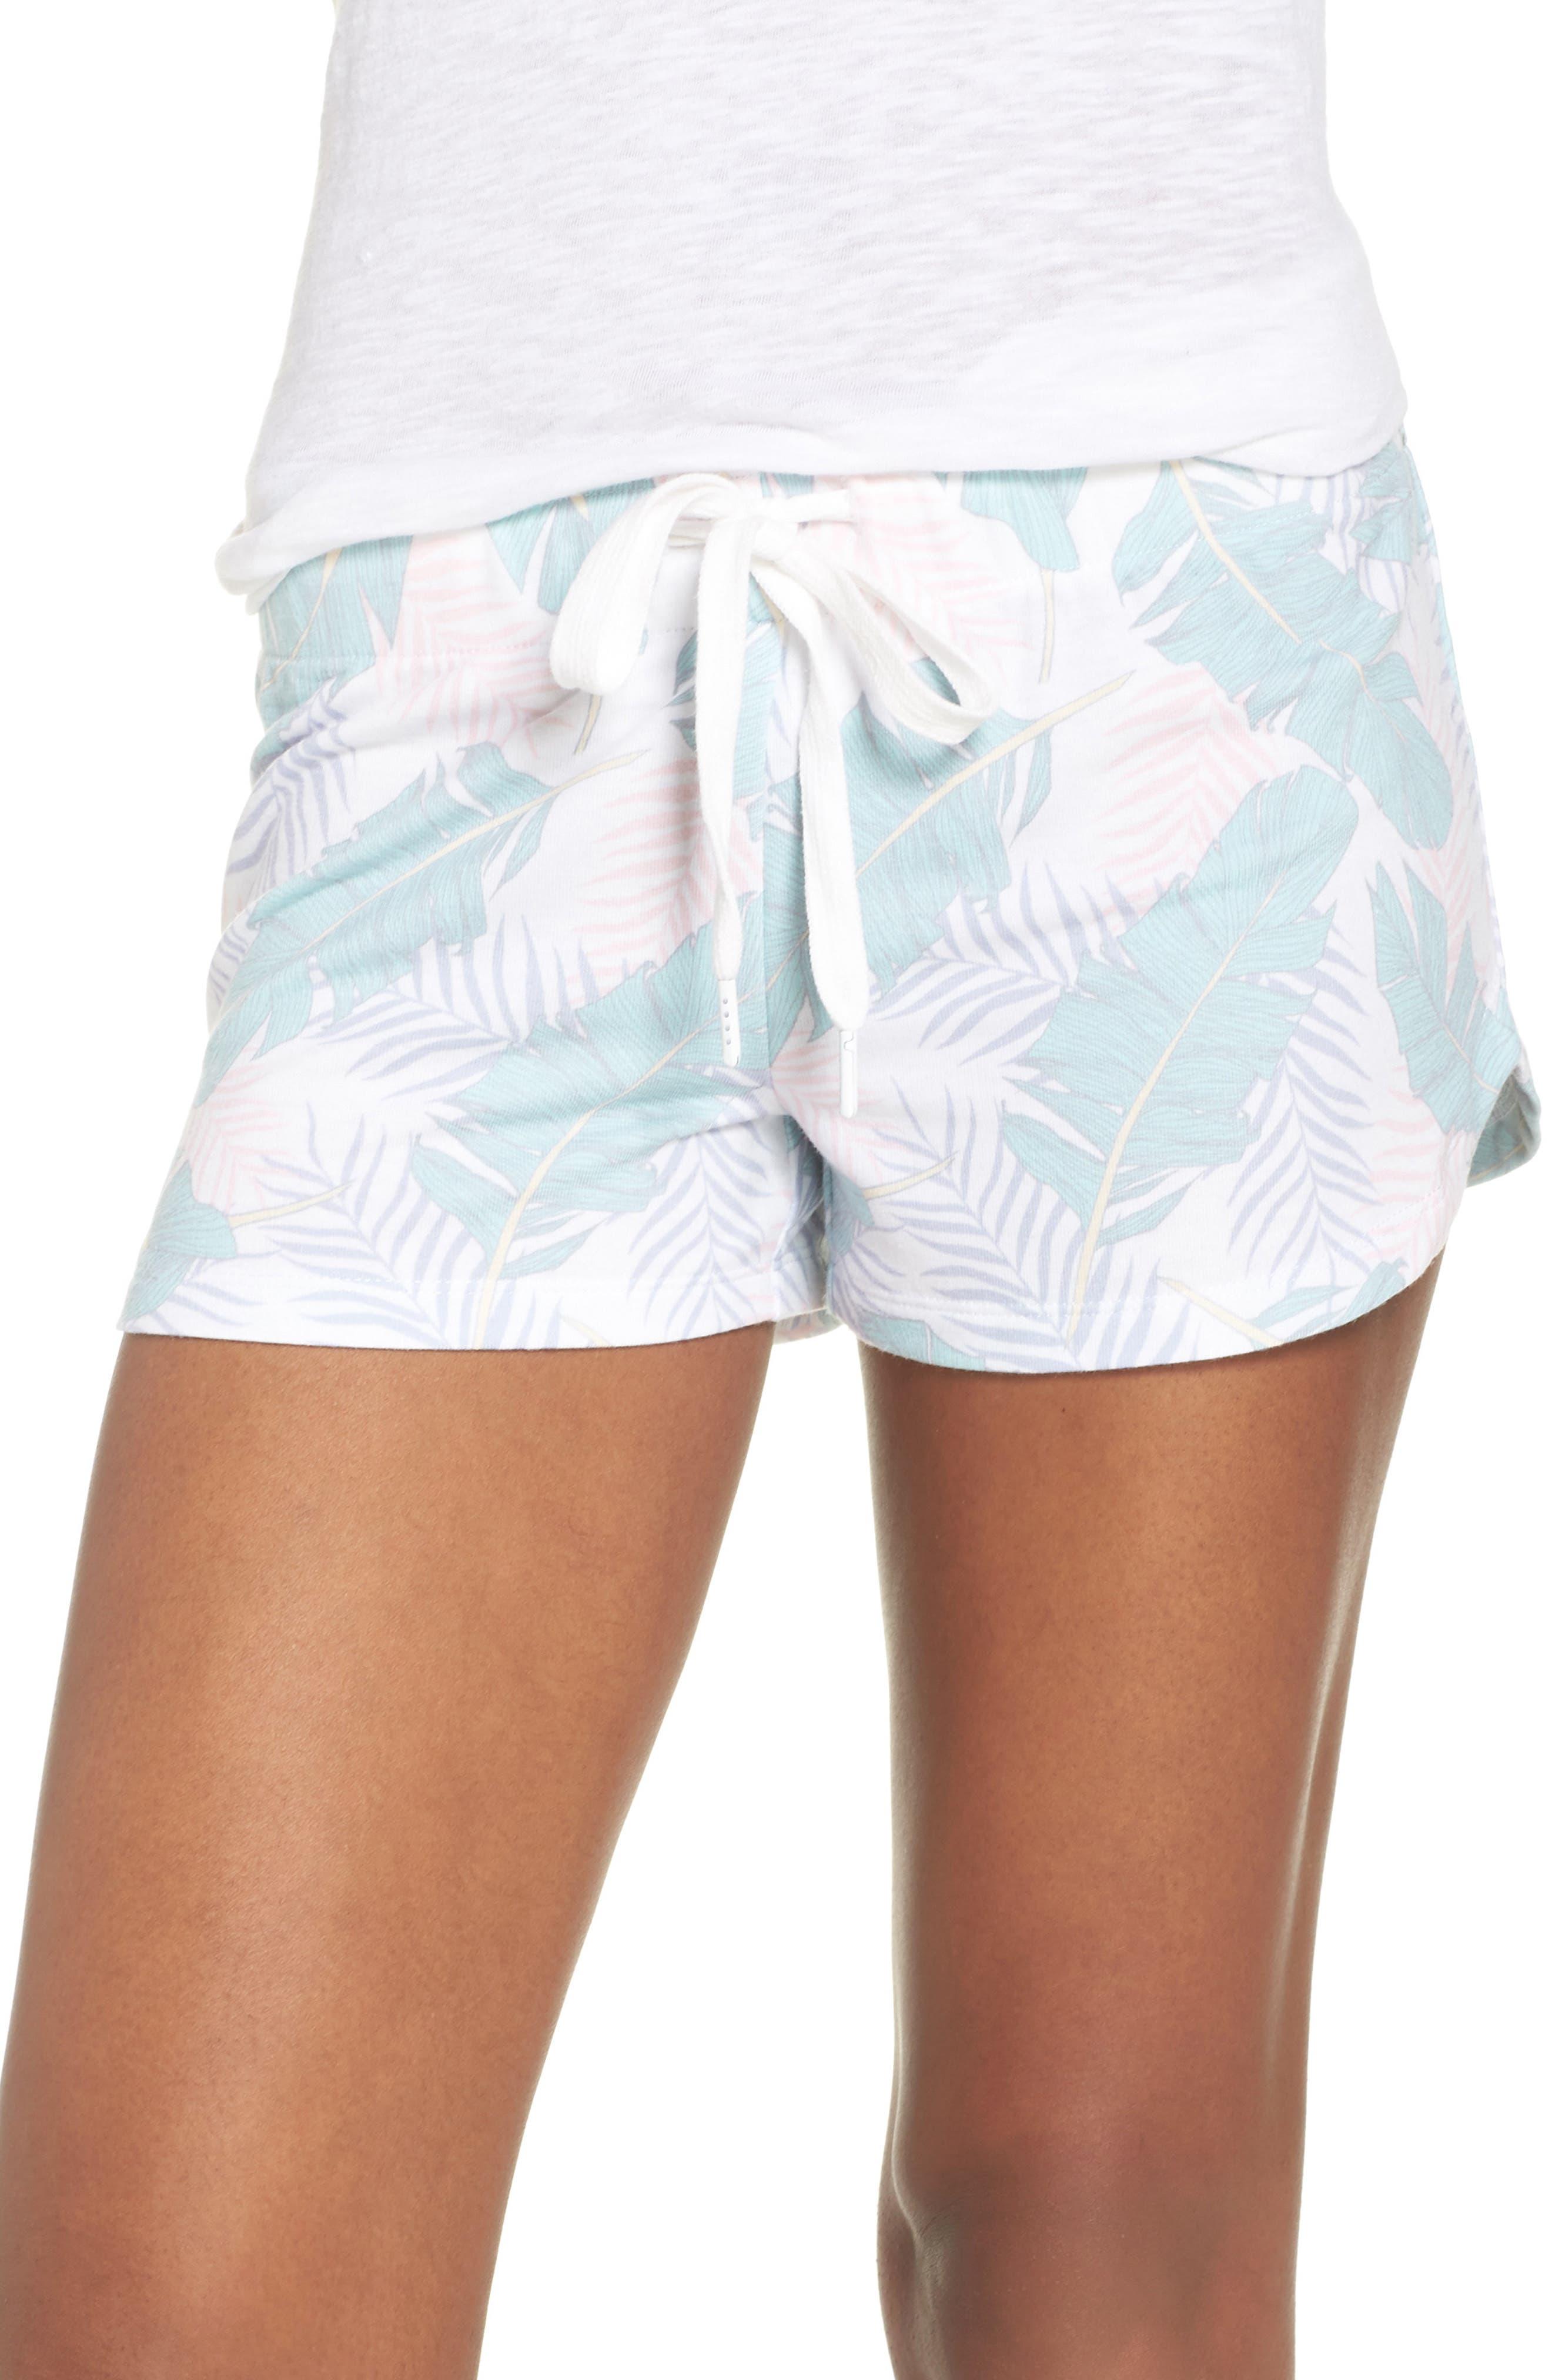 Lounge Shorts,                             Main thumbnail 1, color,                             White